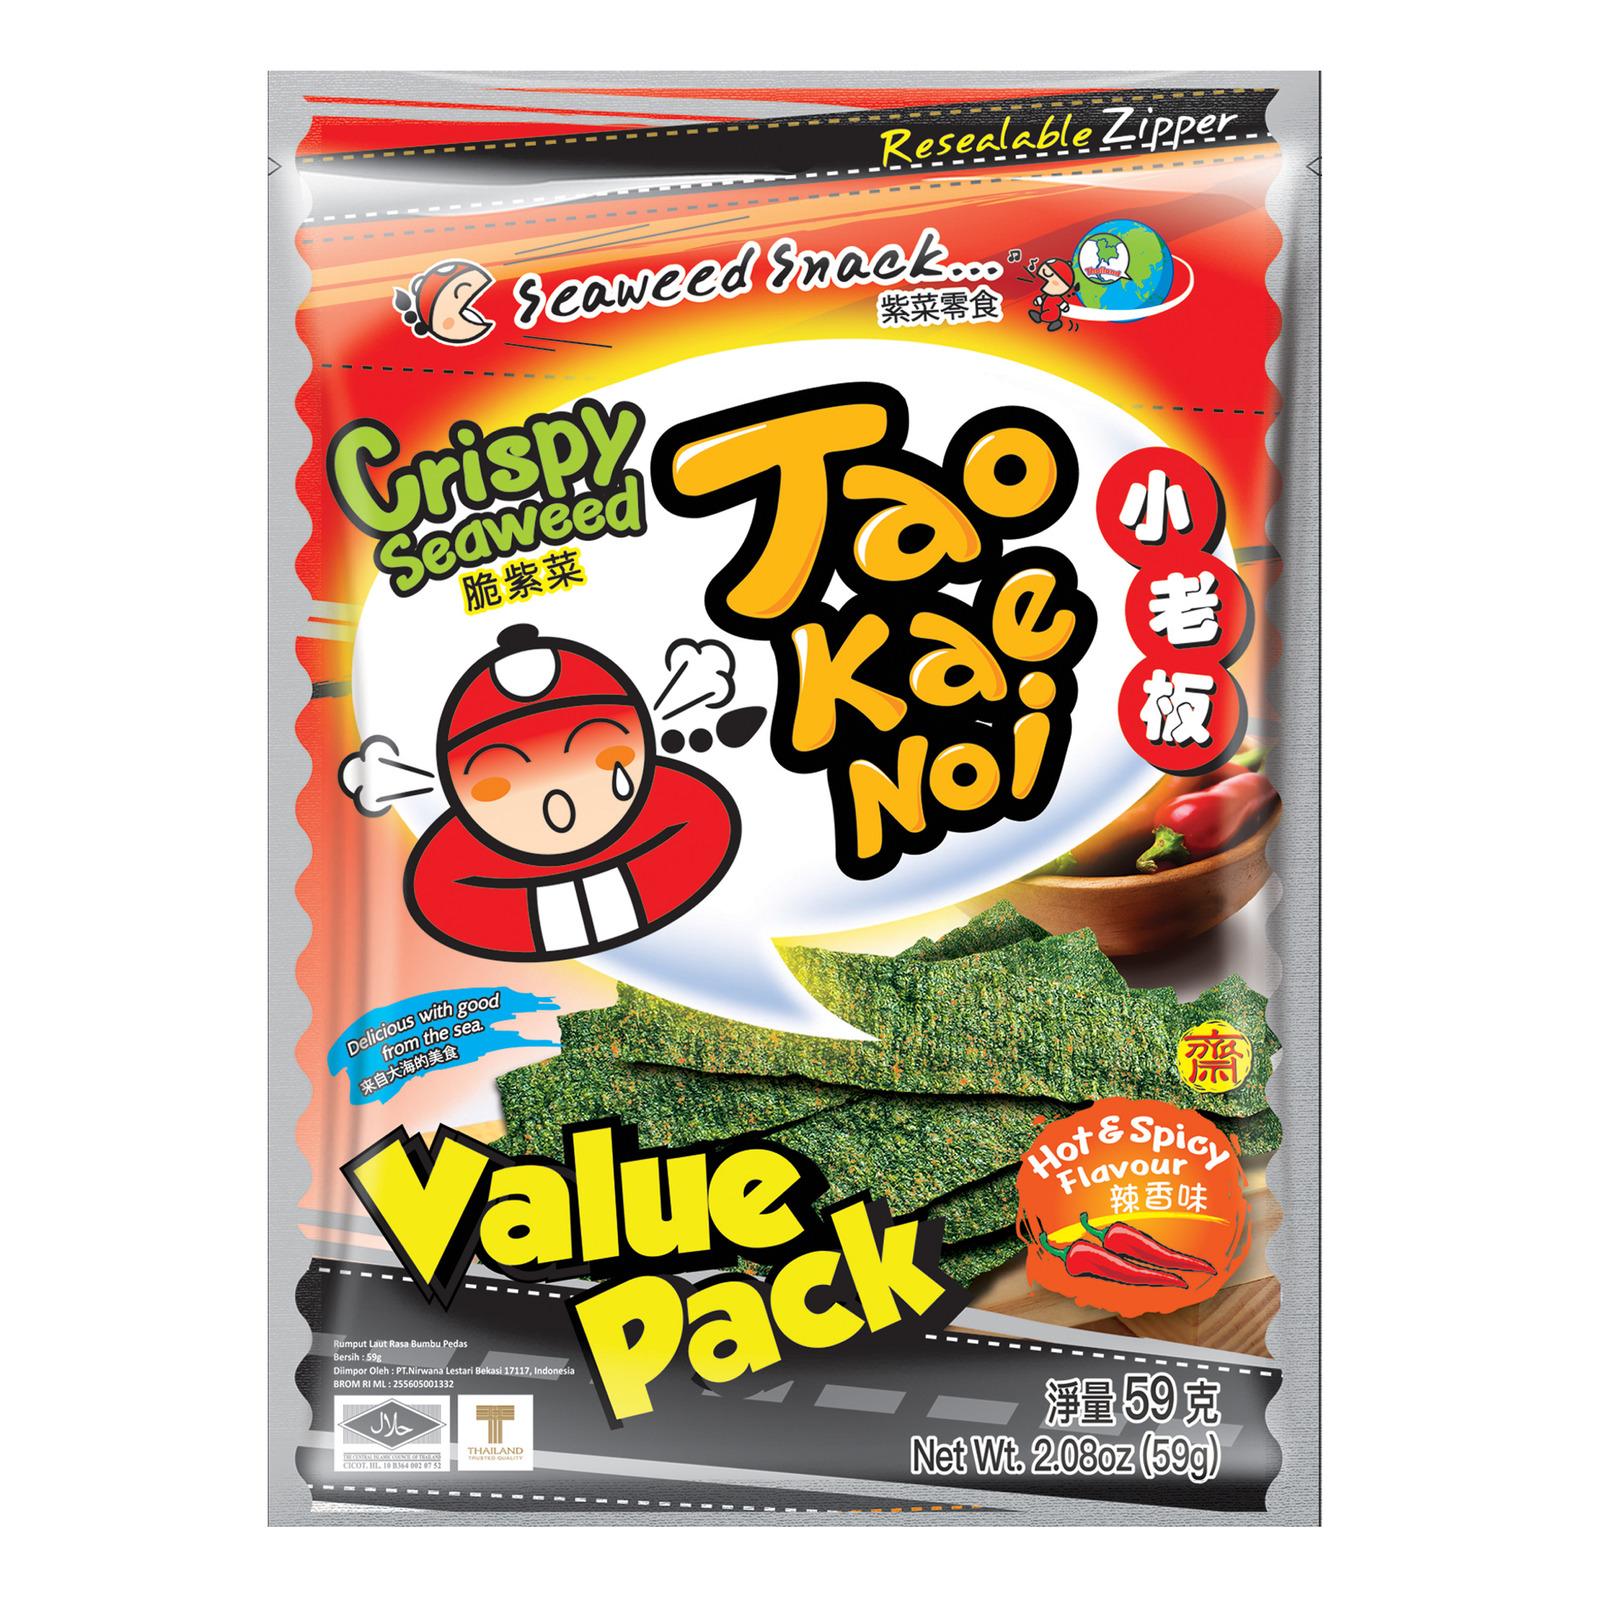 Crispy Seaweed Hot & Spicy 59g TAO KAE NOI